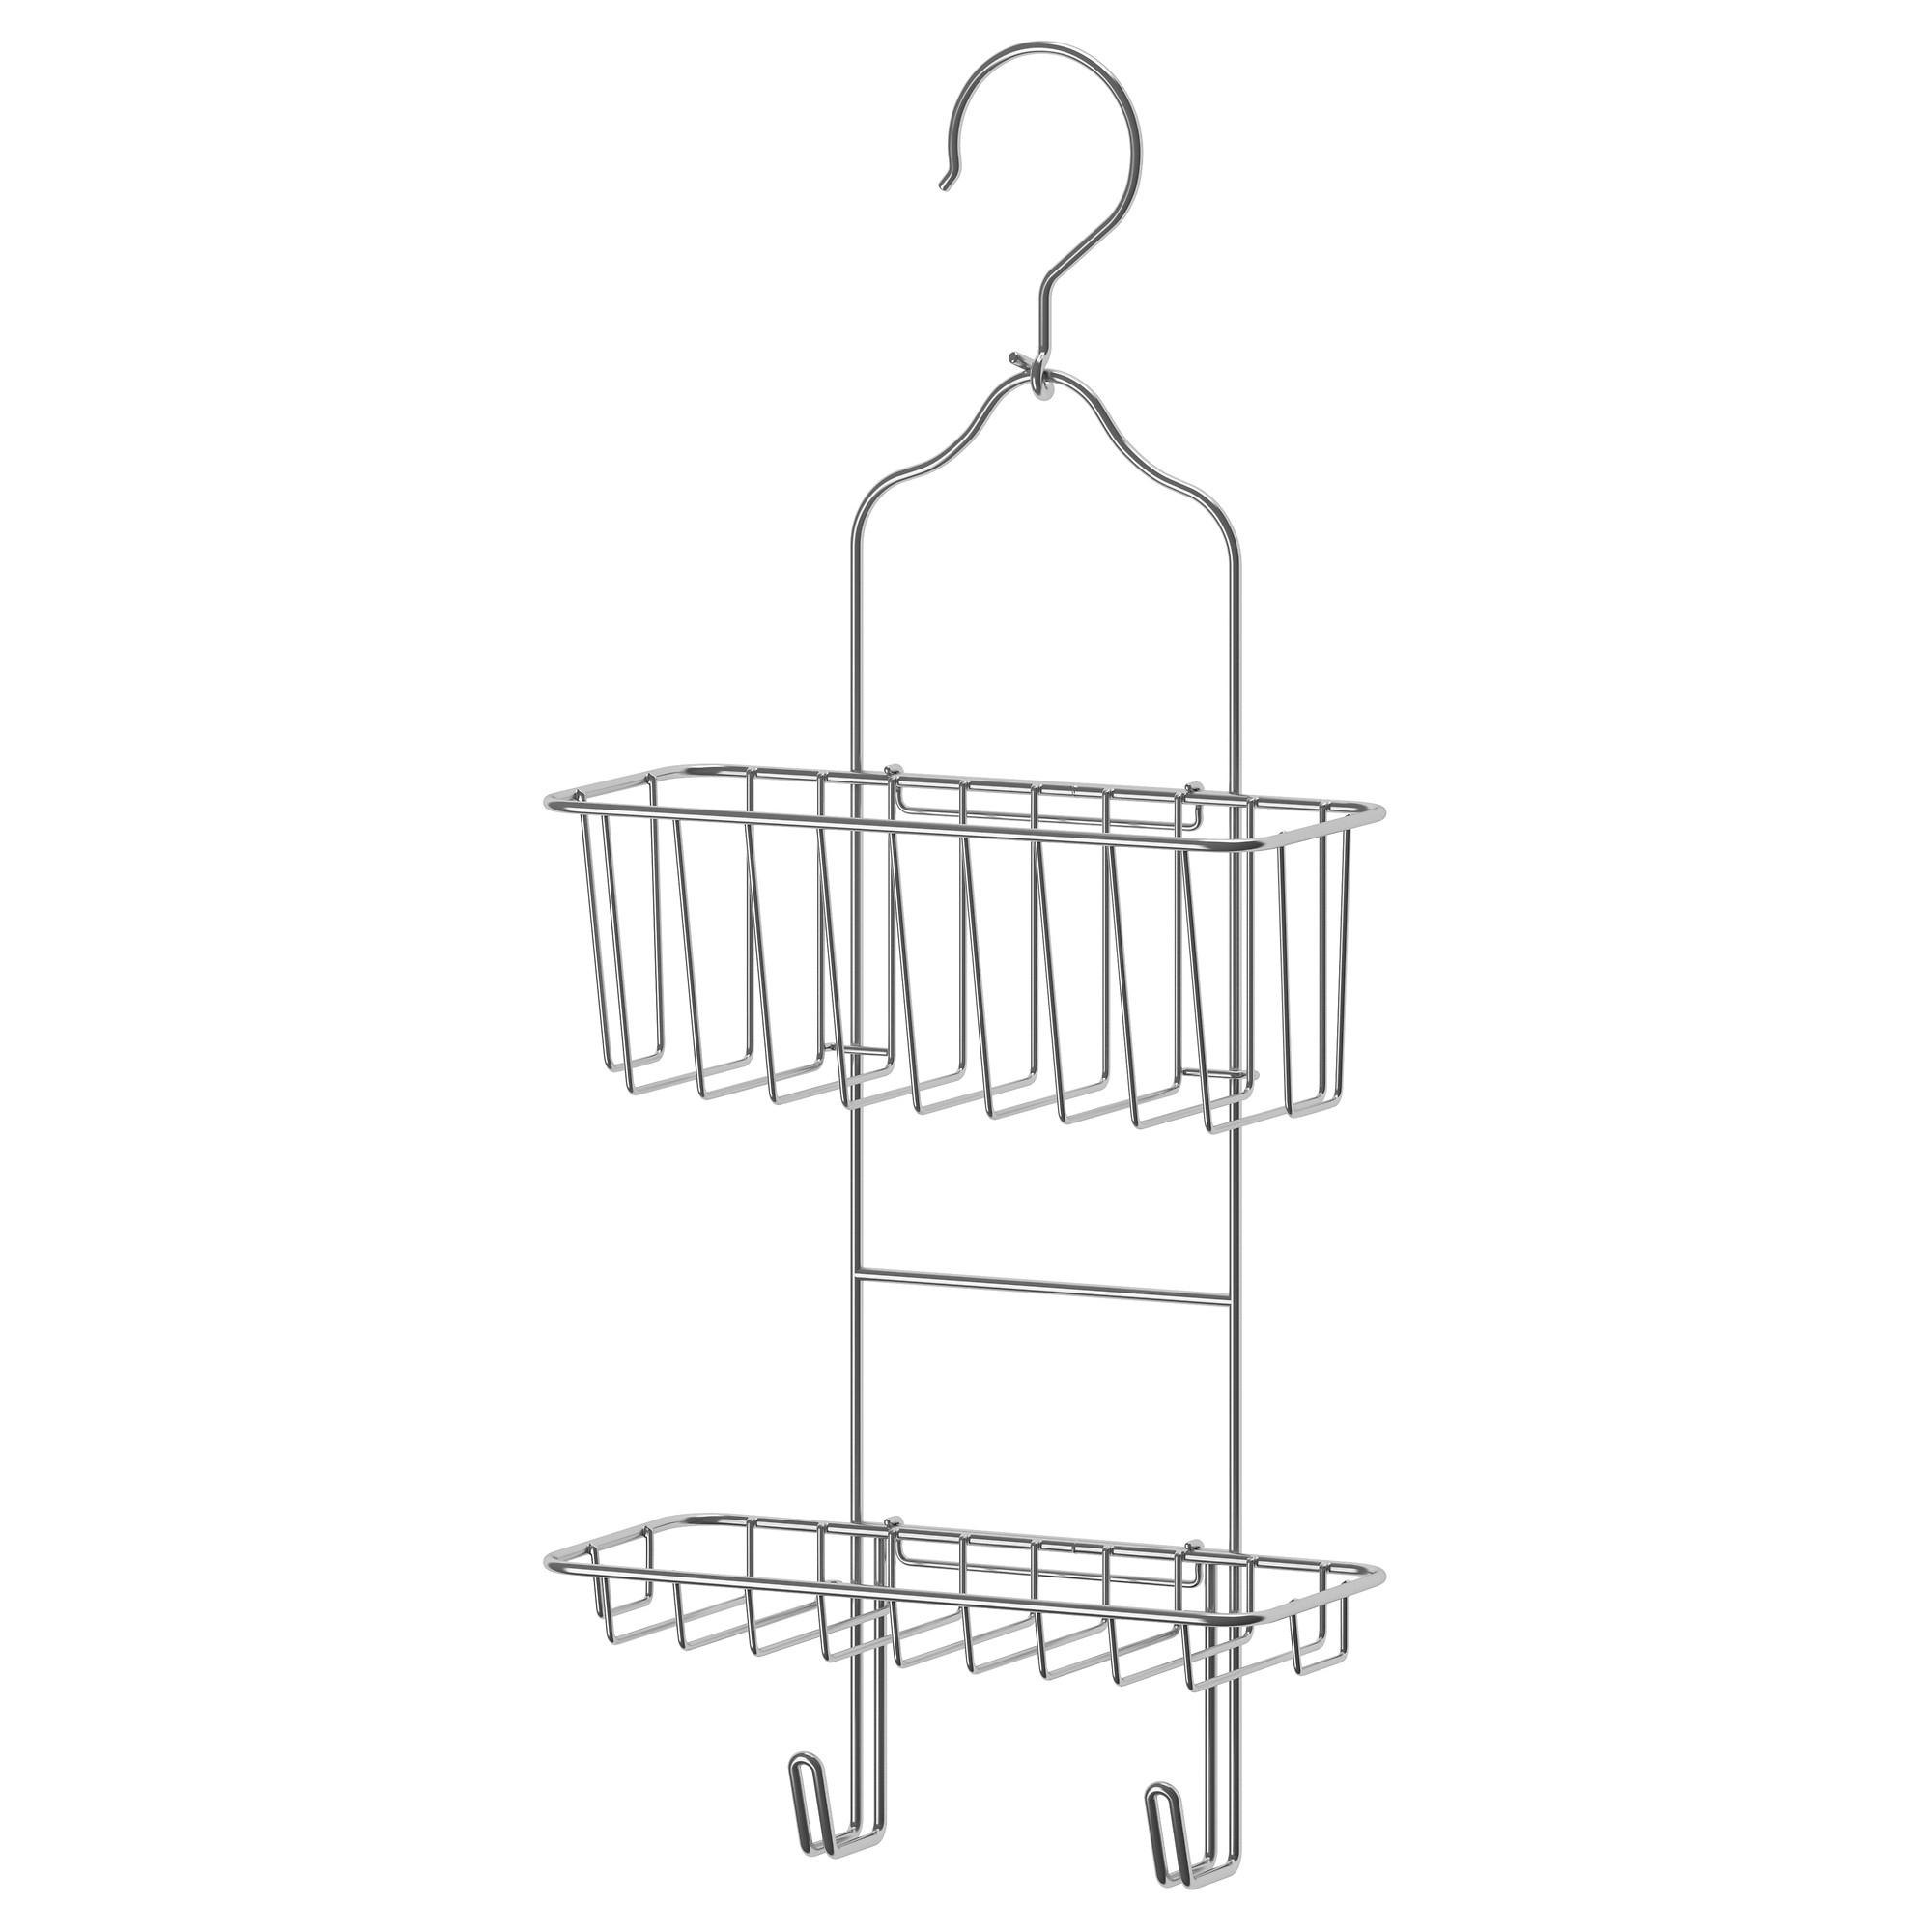 IMMELN shower hanger, two tiers